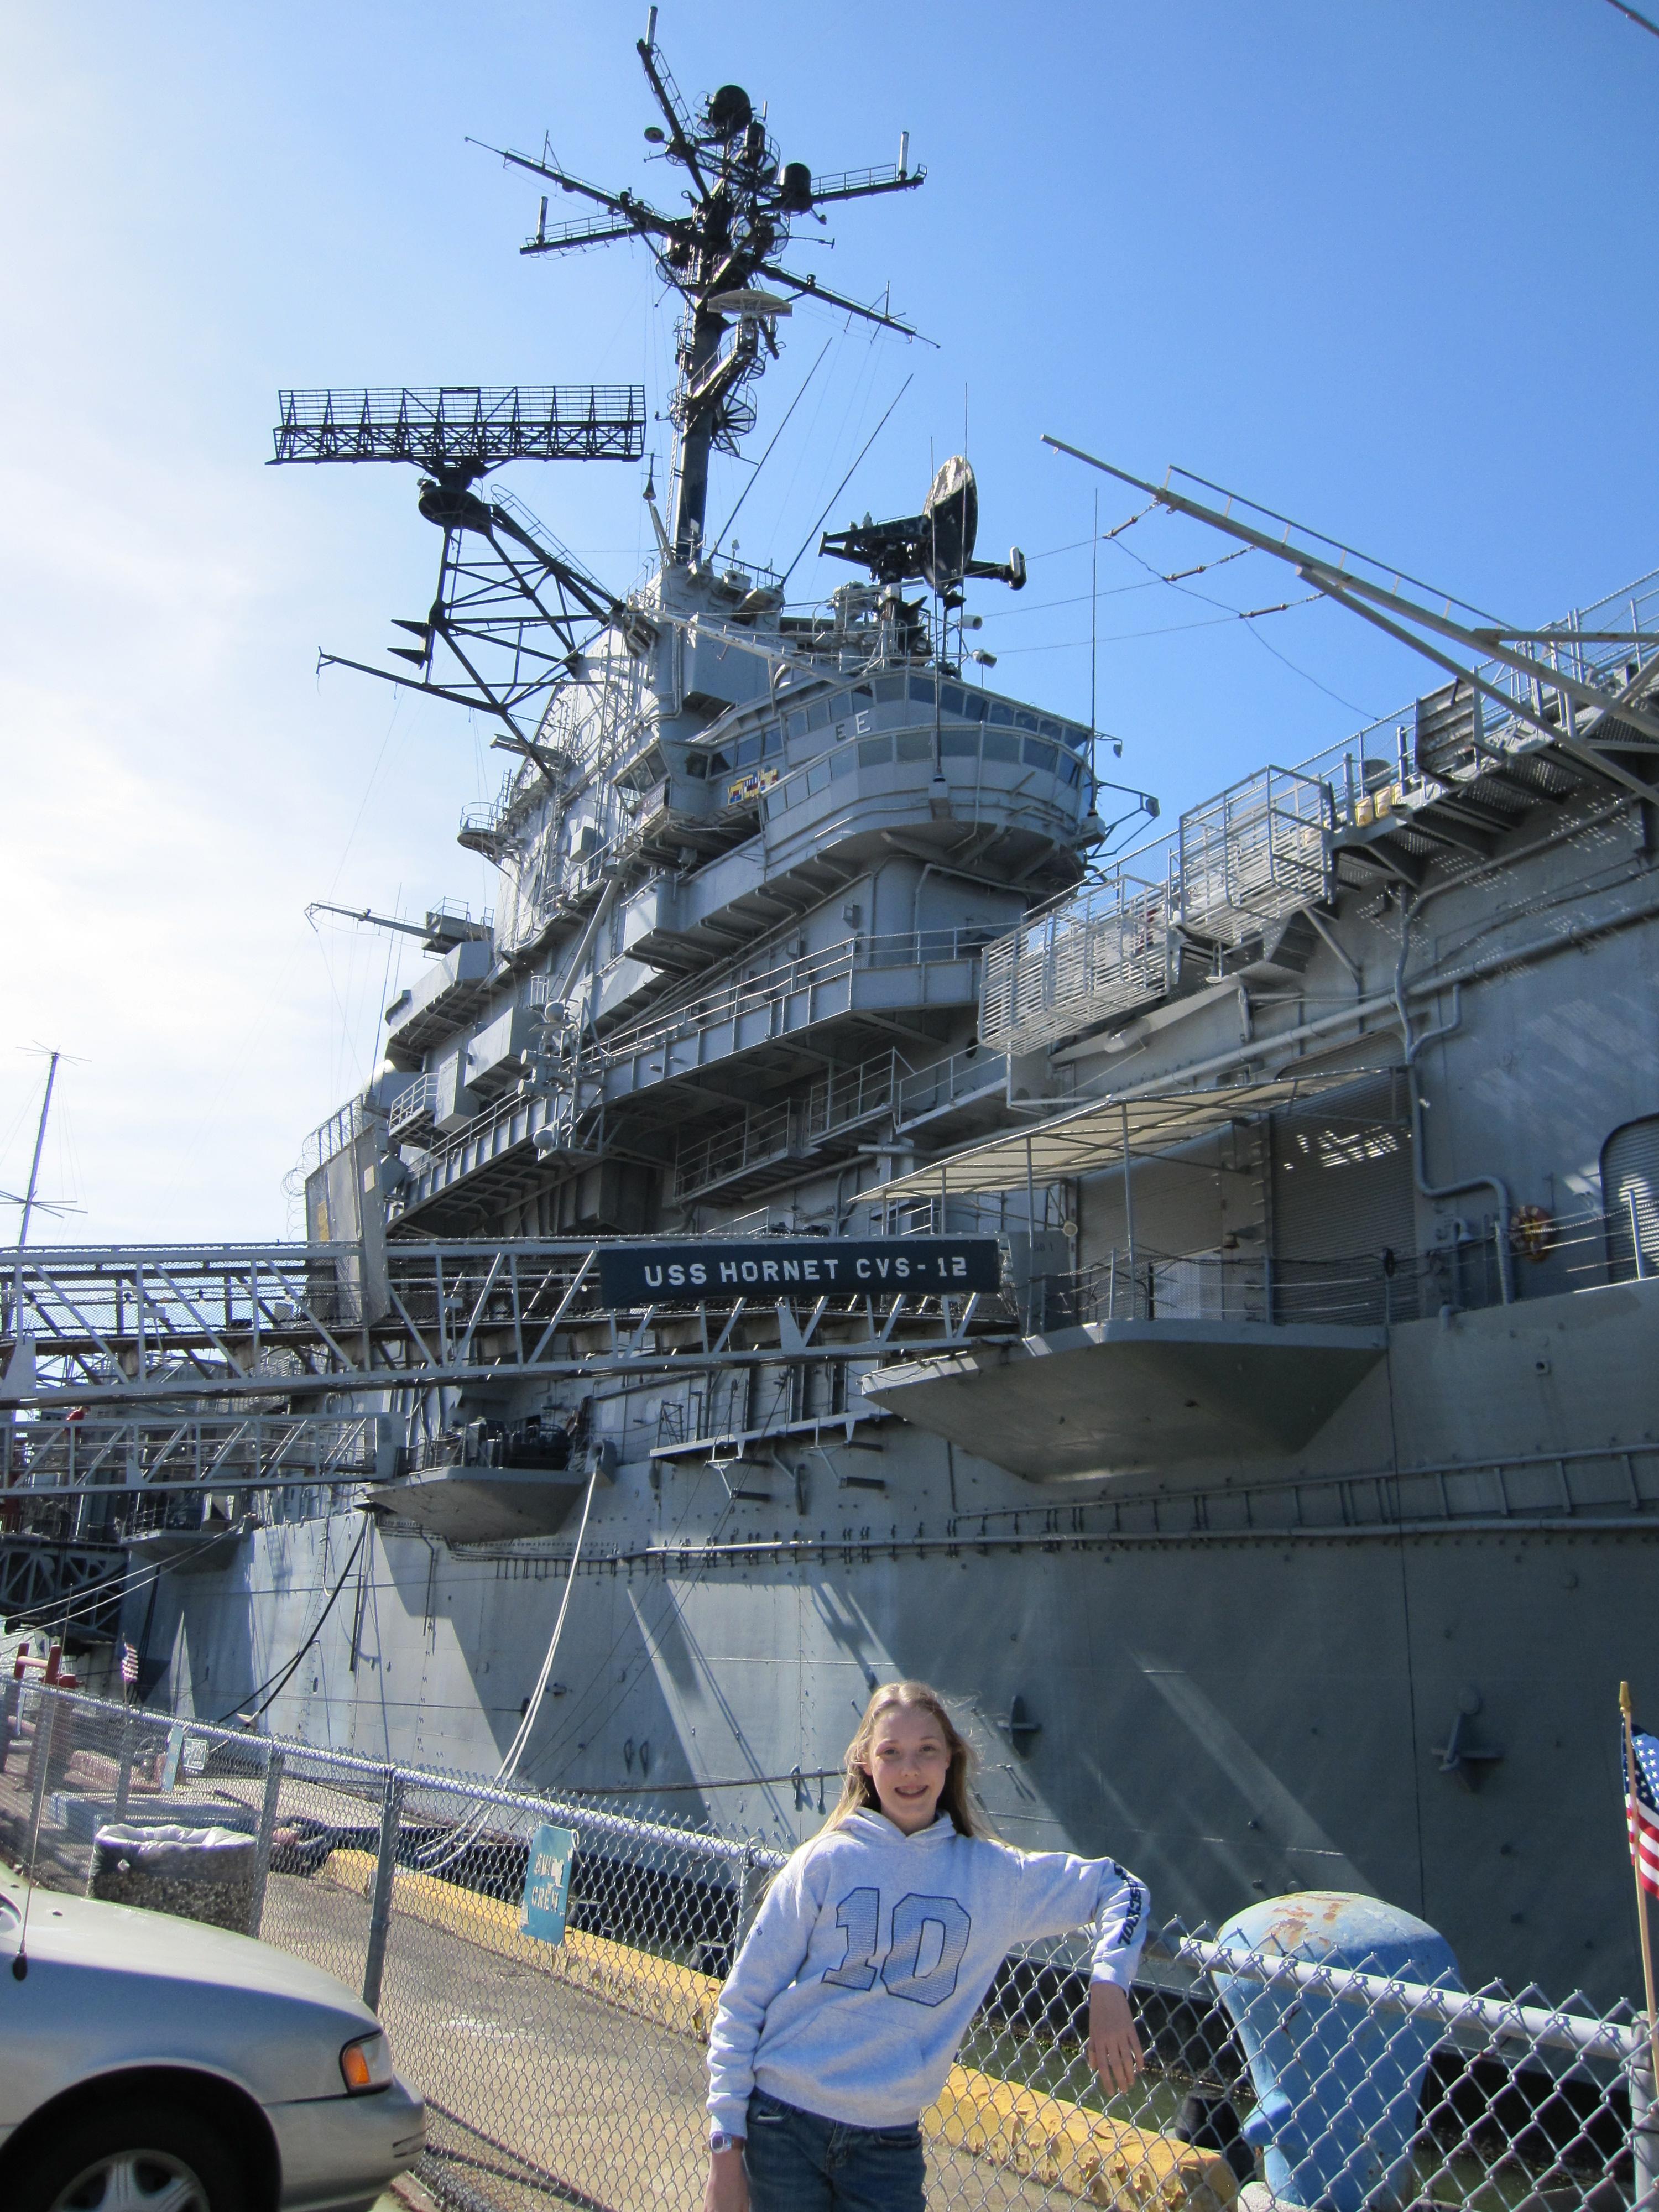 USS Hornet aka the Grey Ghost | hikethis